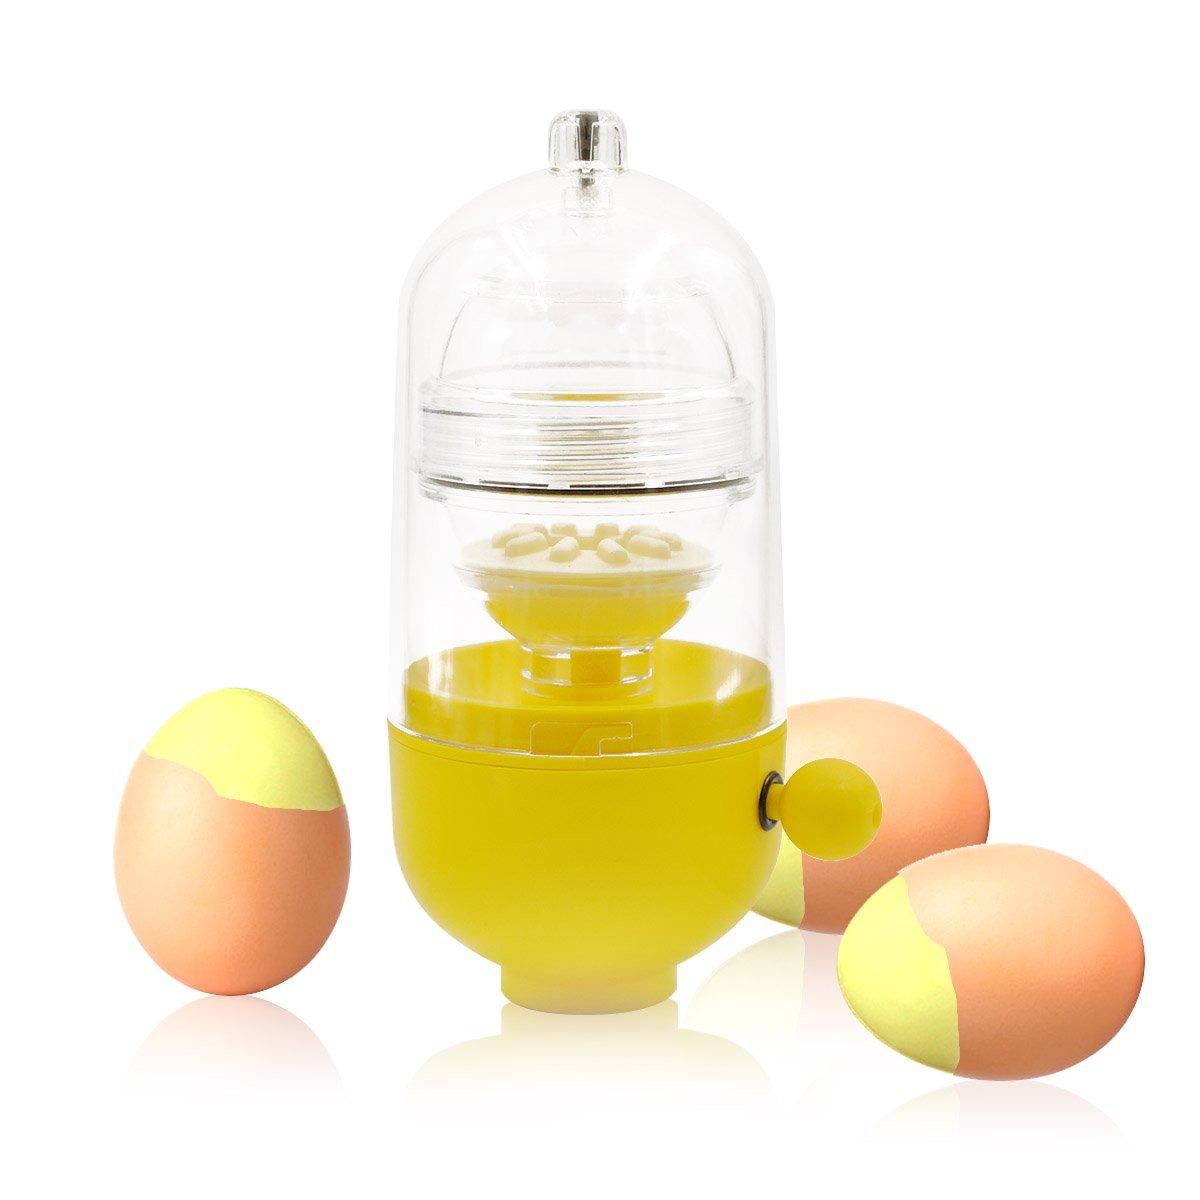 Hutzler Egg Scrambler Brown